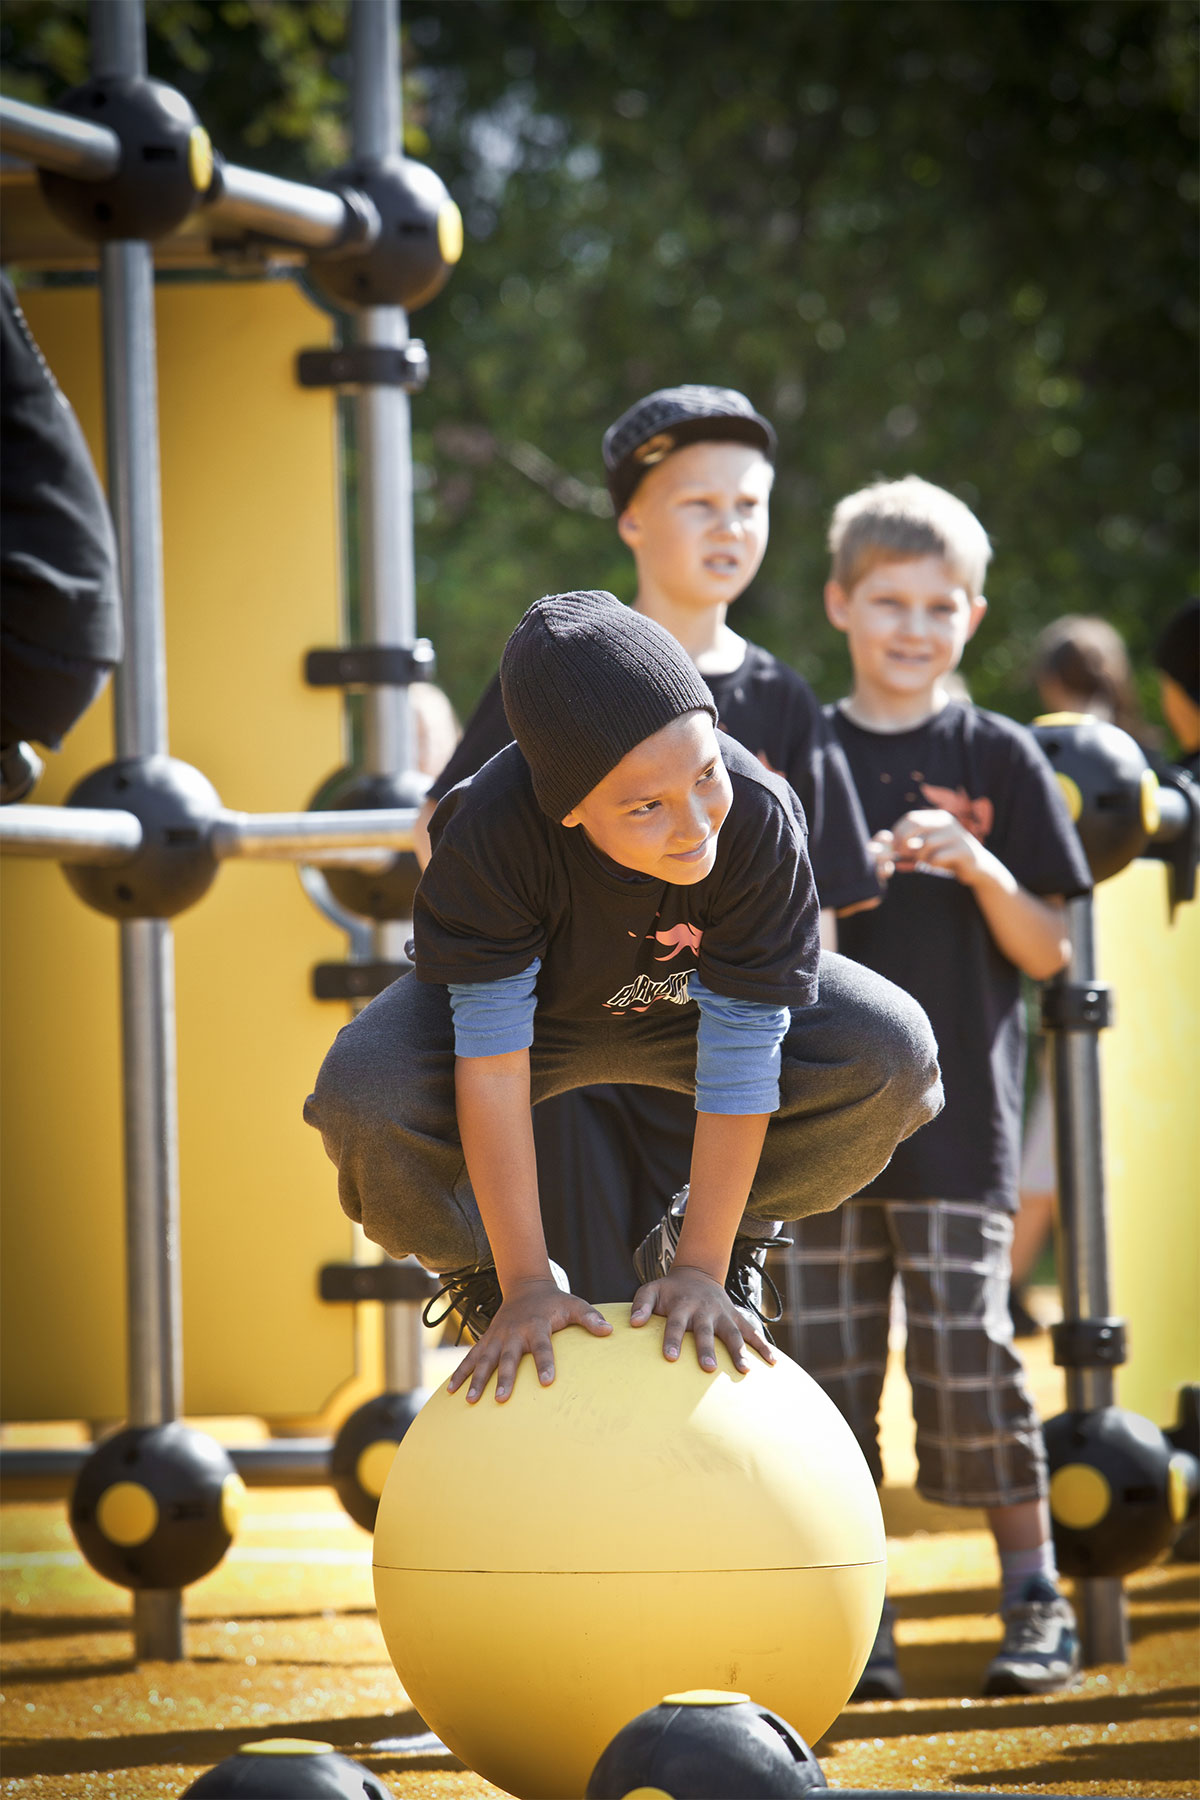 yellow balancing ball